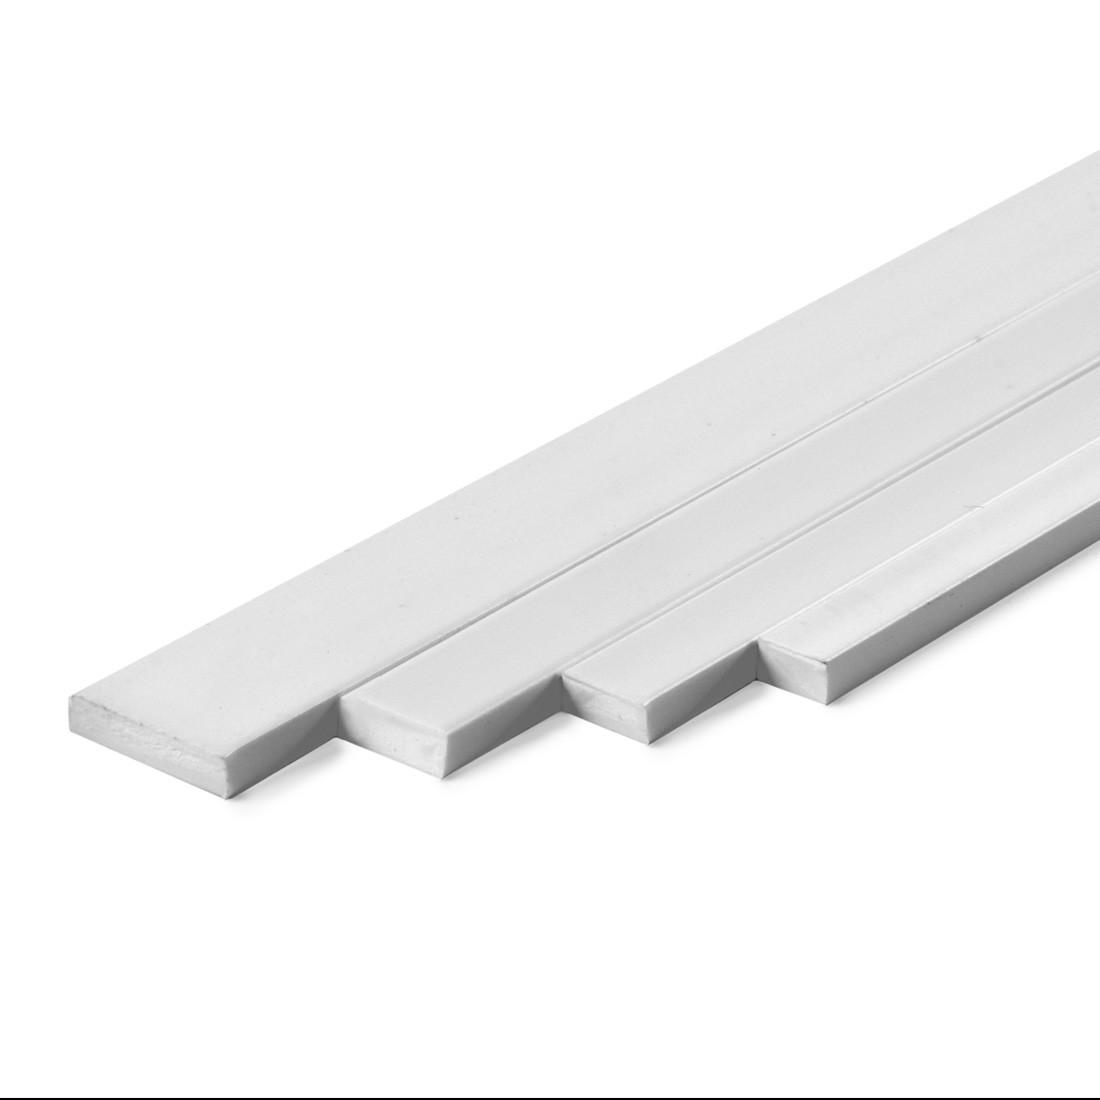 ASA rectangular profile mm.2x8x1000